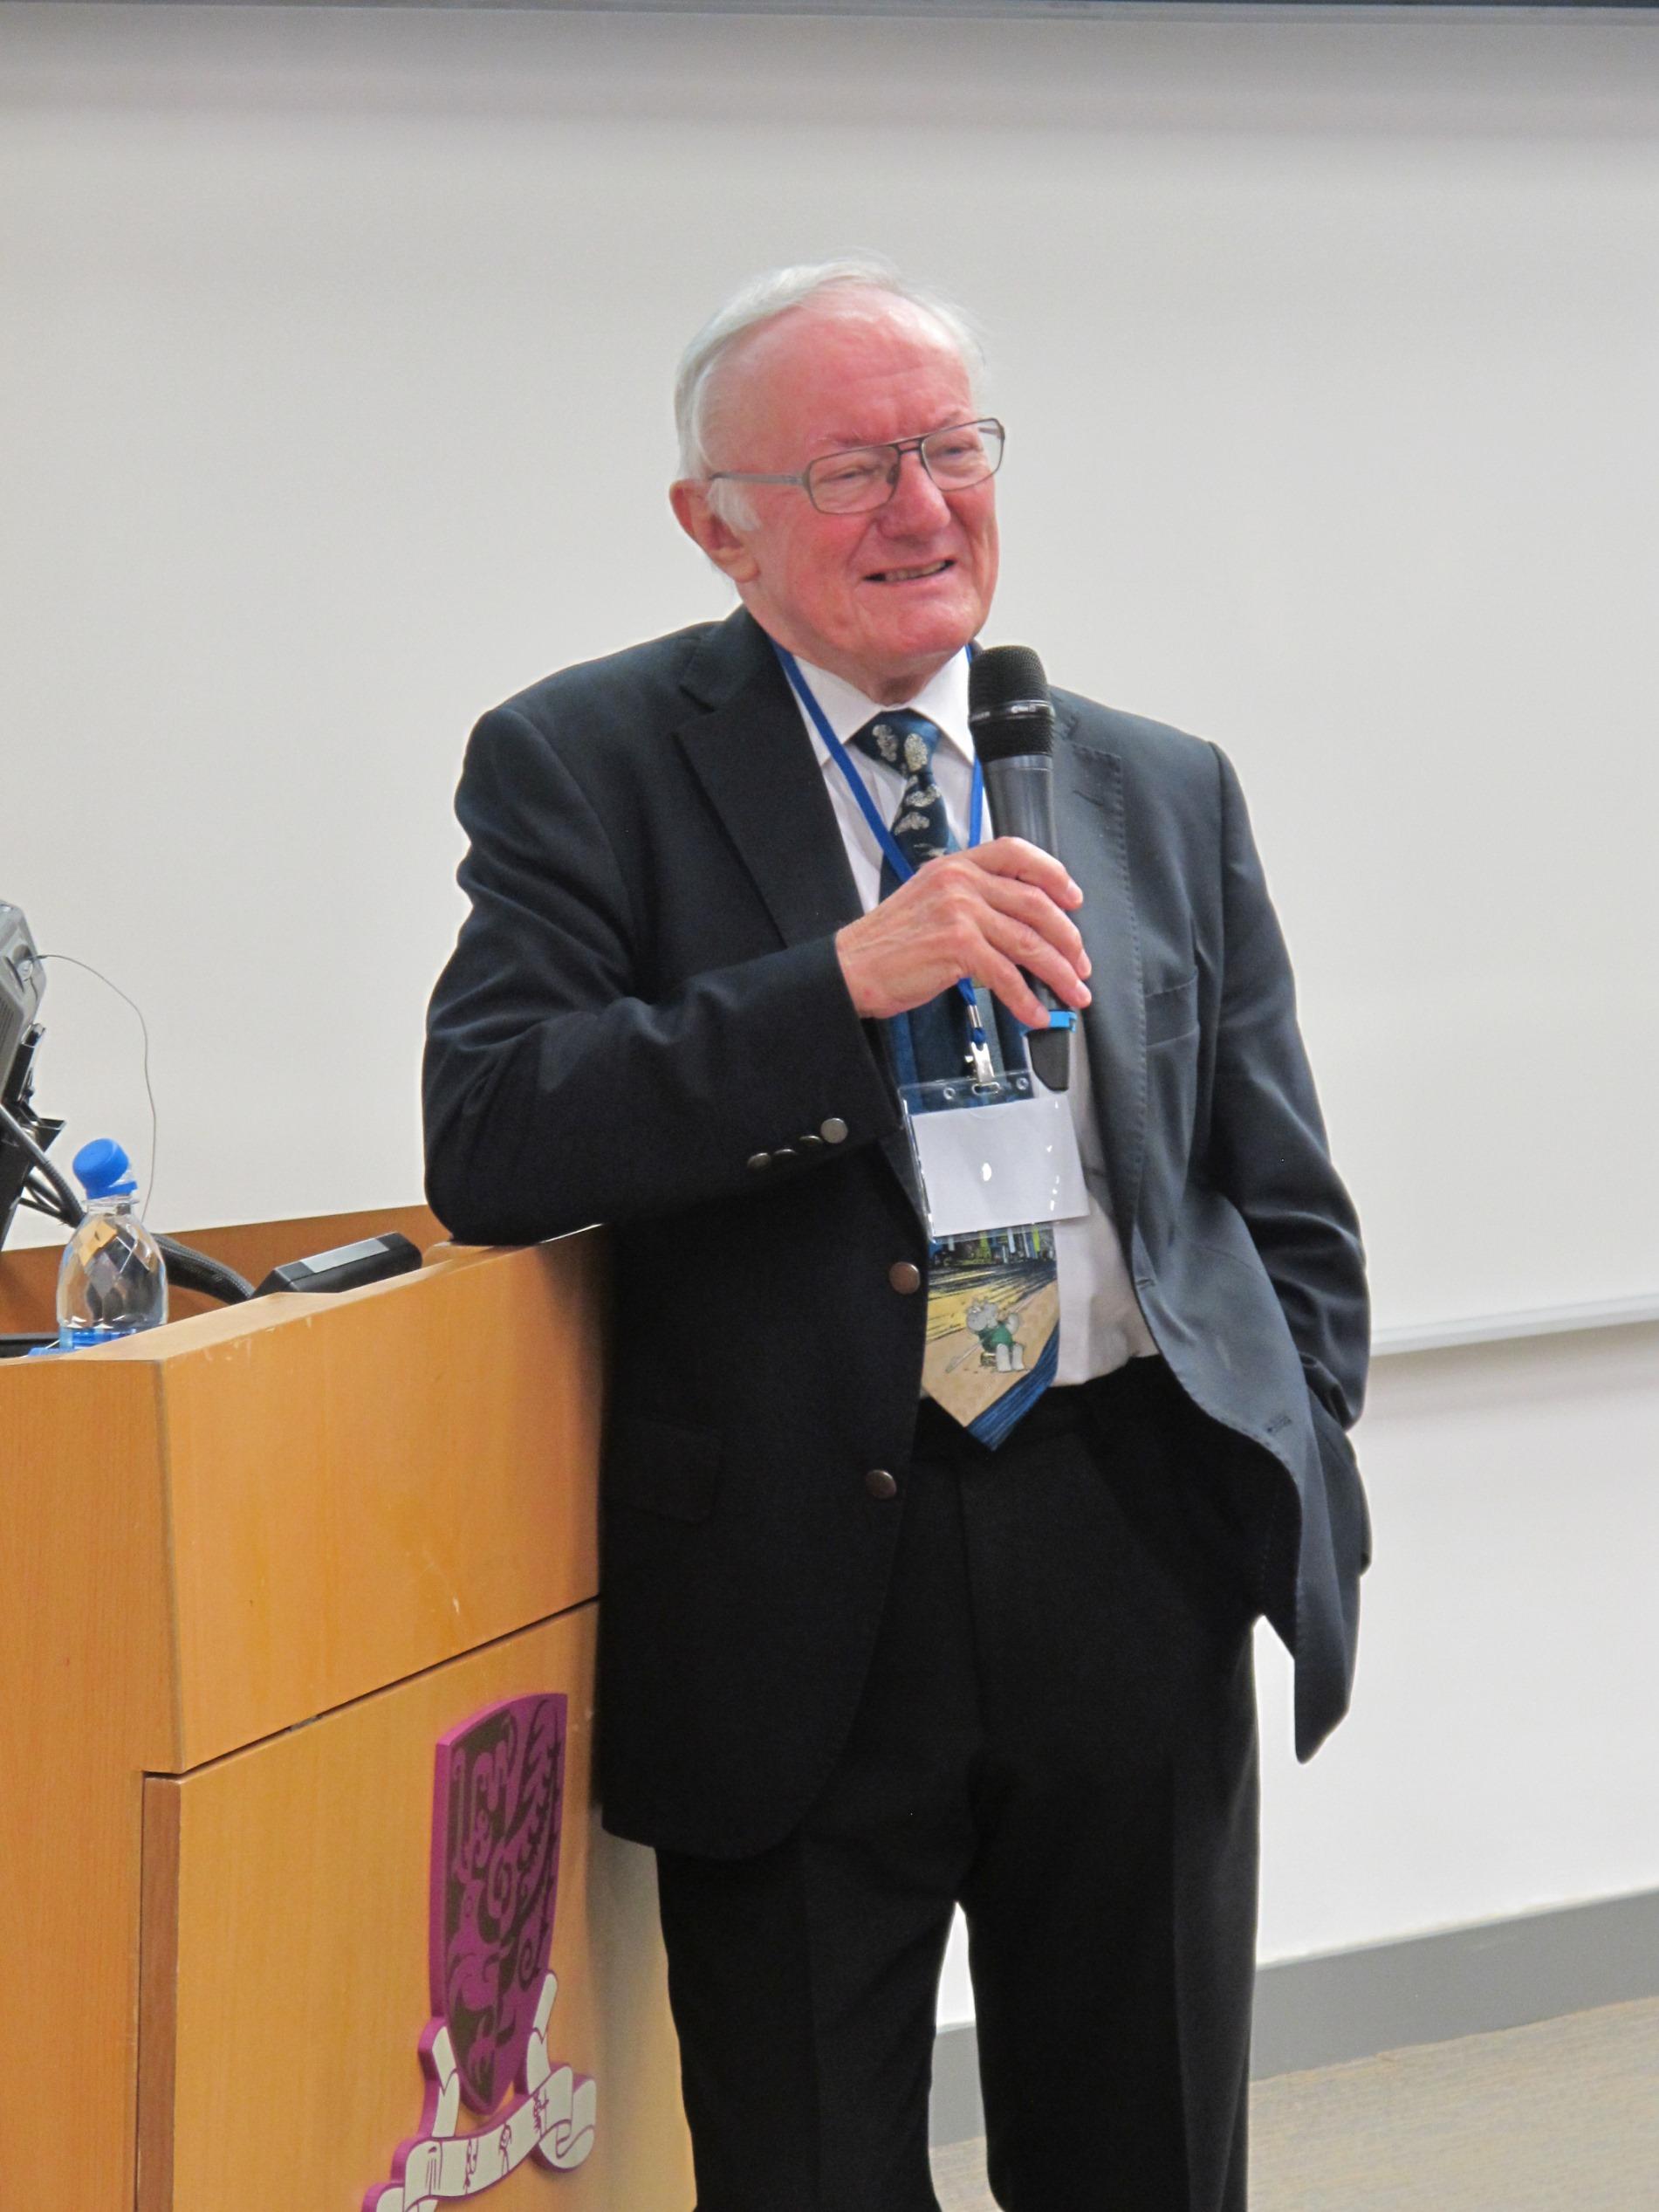 Michael Batty教授就题目「定义长远城市变化」演讲。